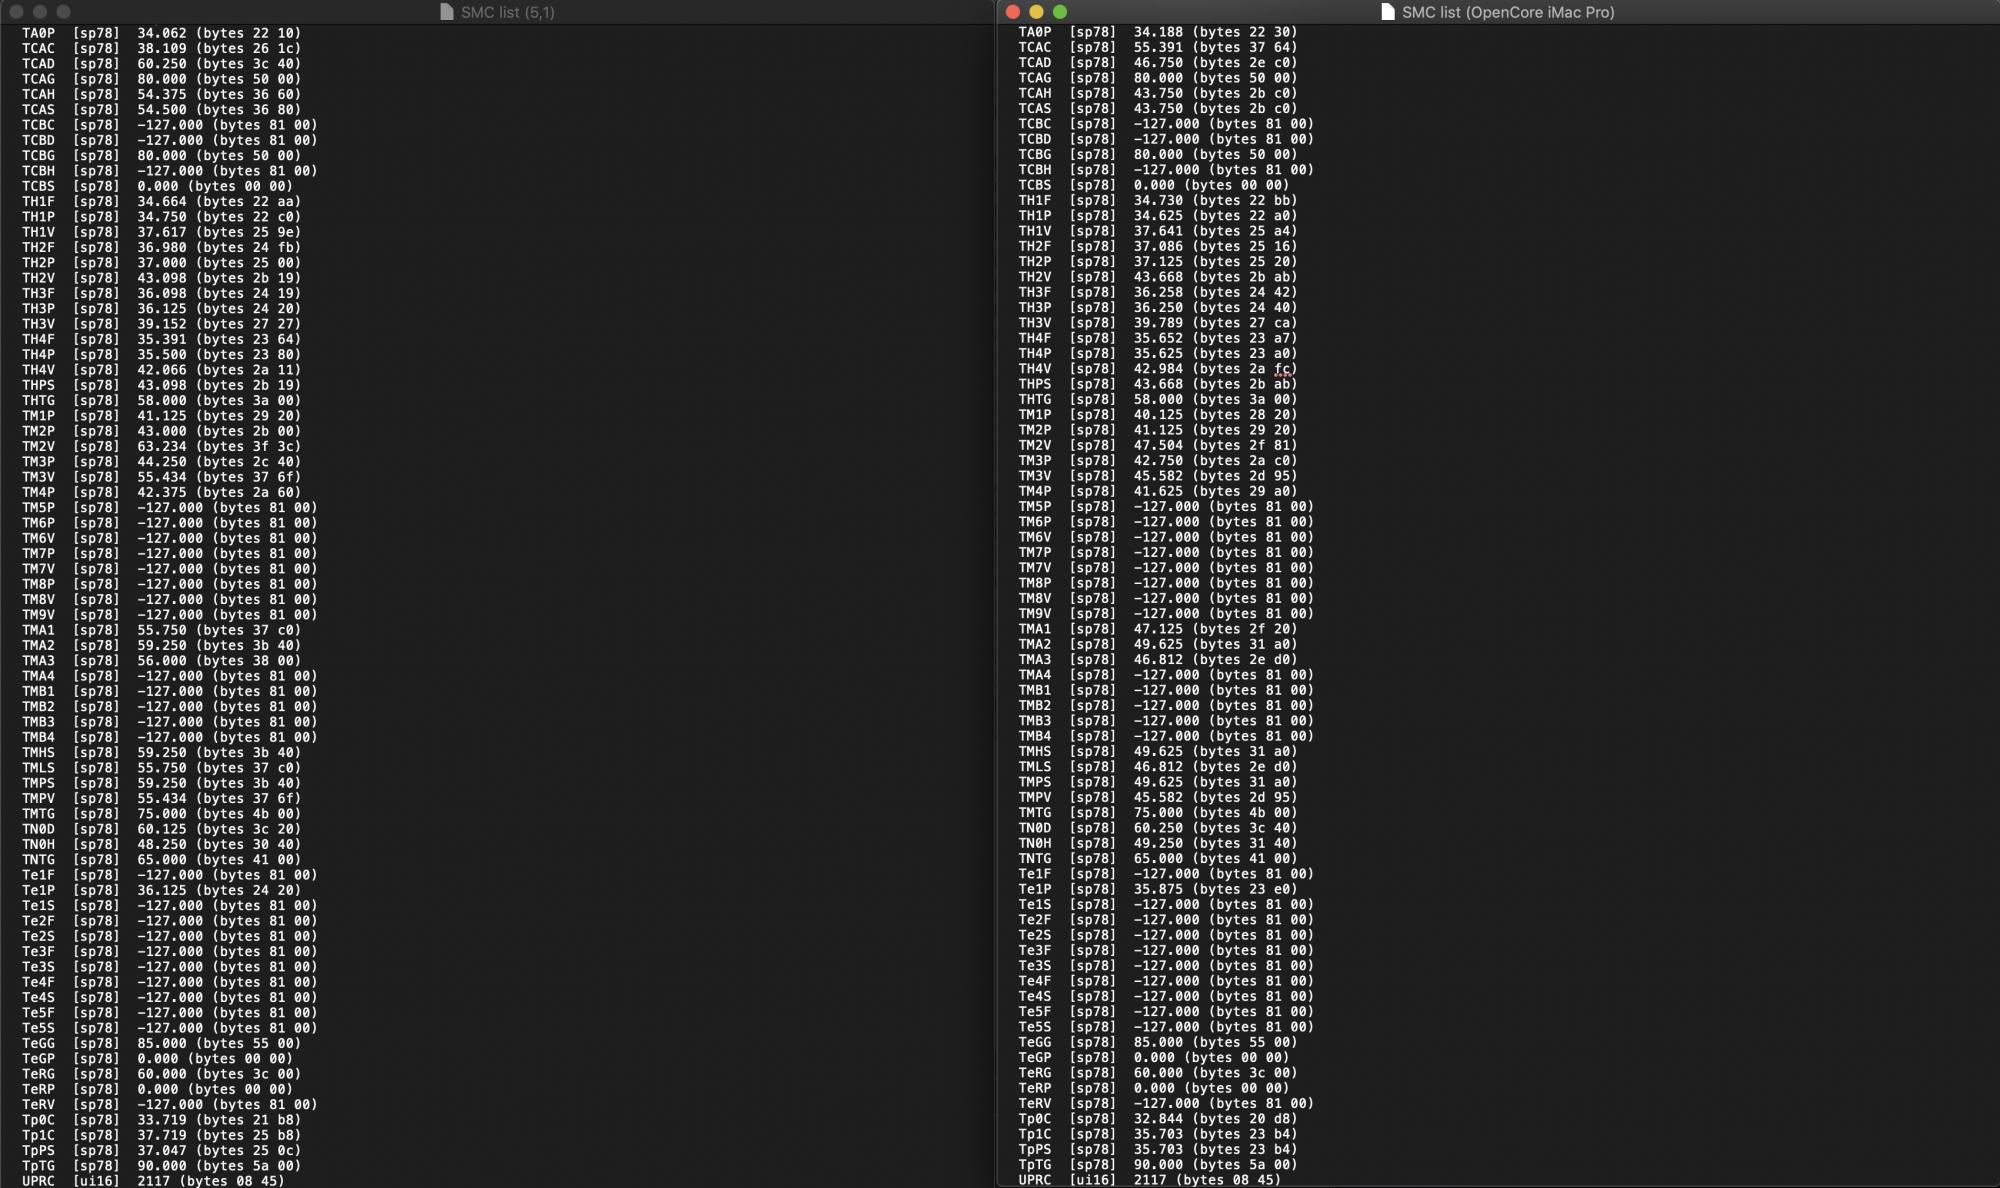 Screenshot 2019-10-31 at 9.53.14 PM.png